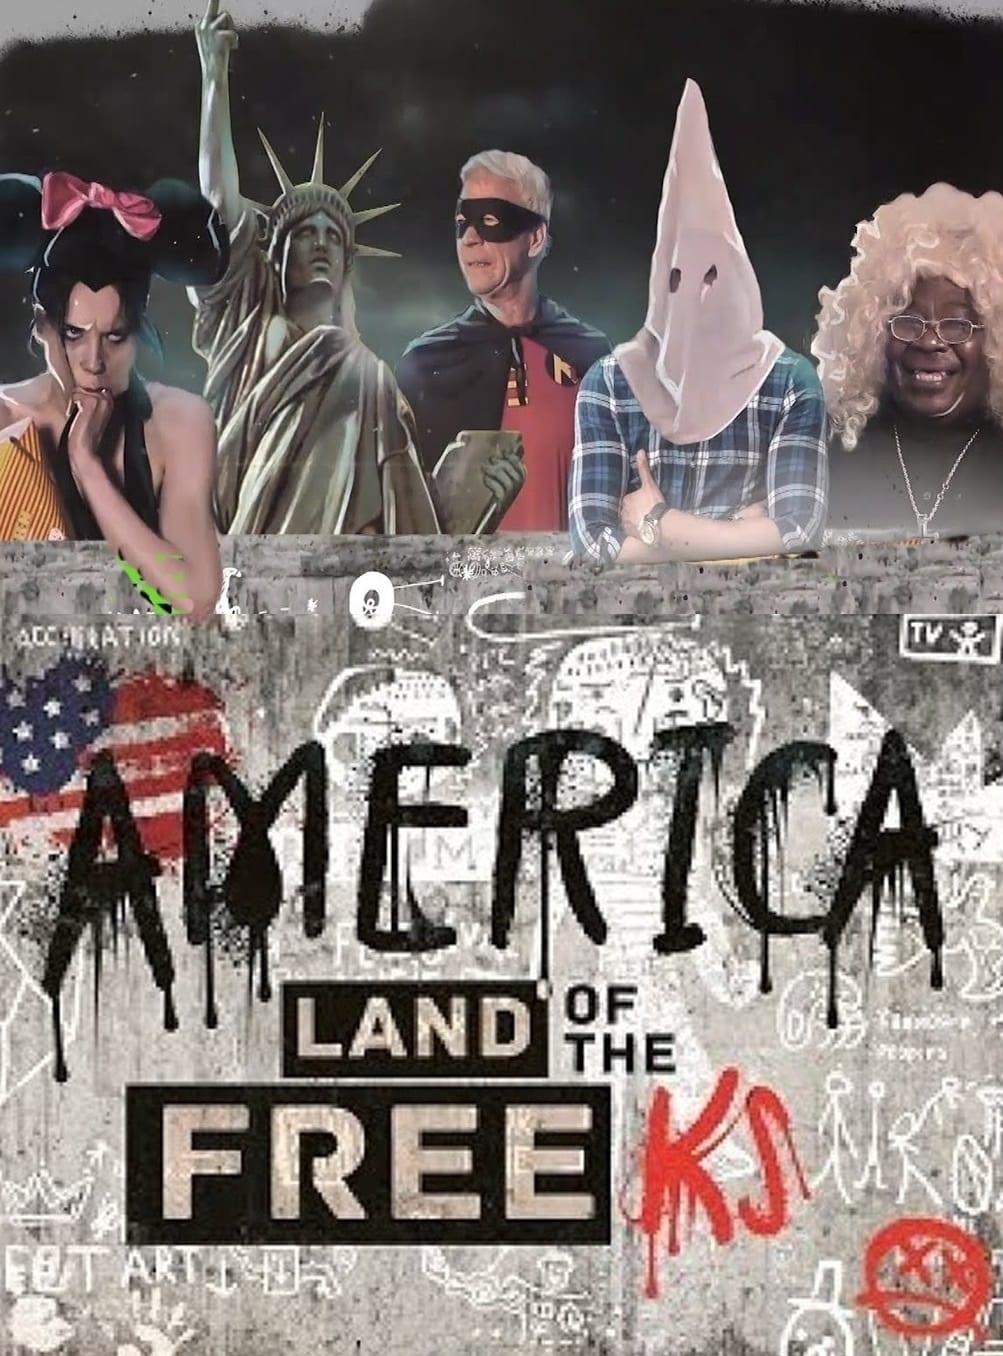 America: Land of the Freeks